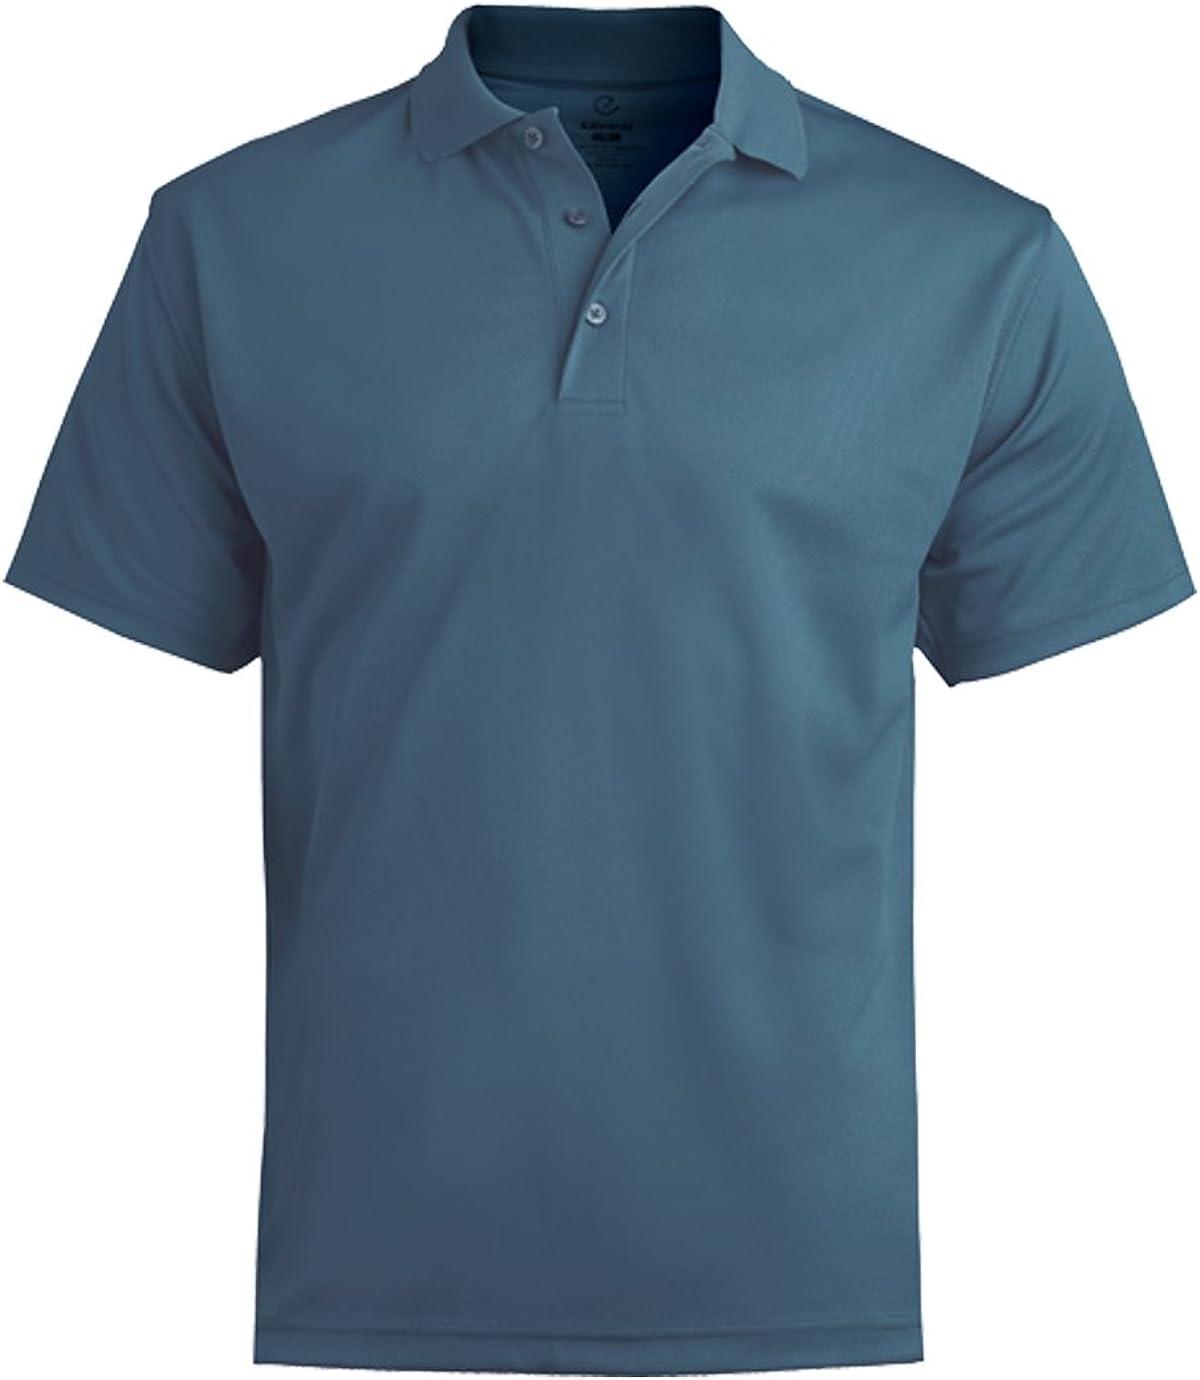 Ed Garments Men's Dry-Mesh Polo Shirt, SLATE BLUE, 5X-Large Tall